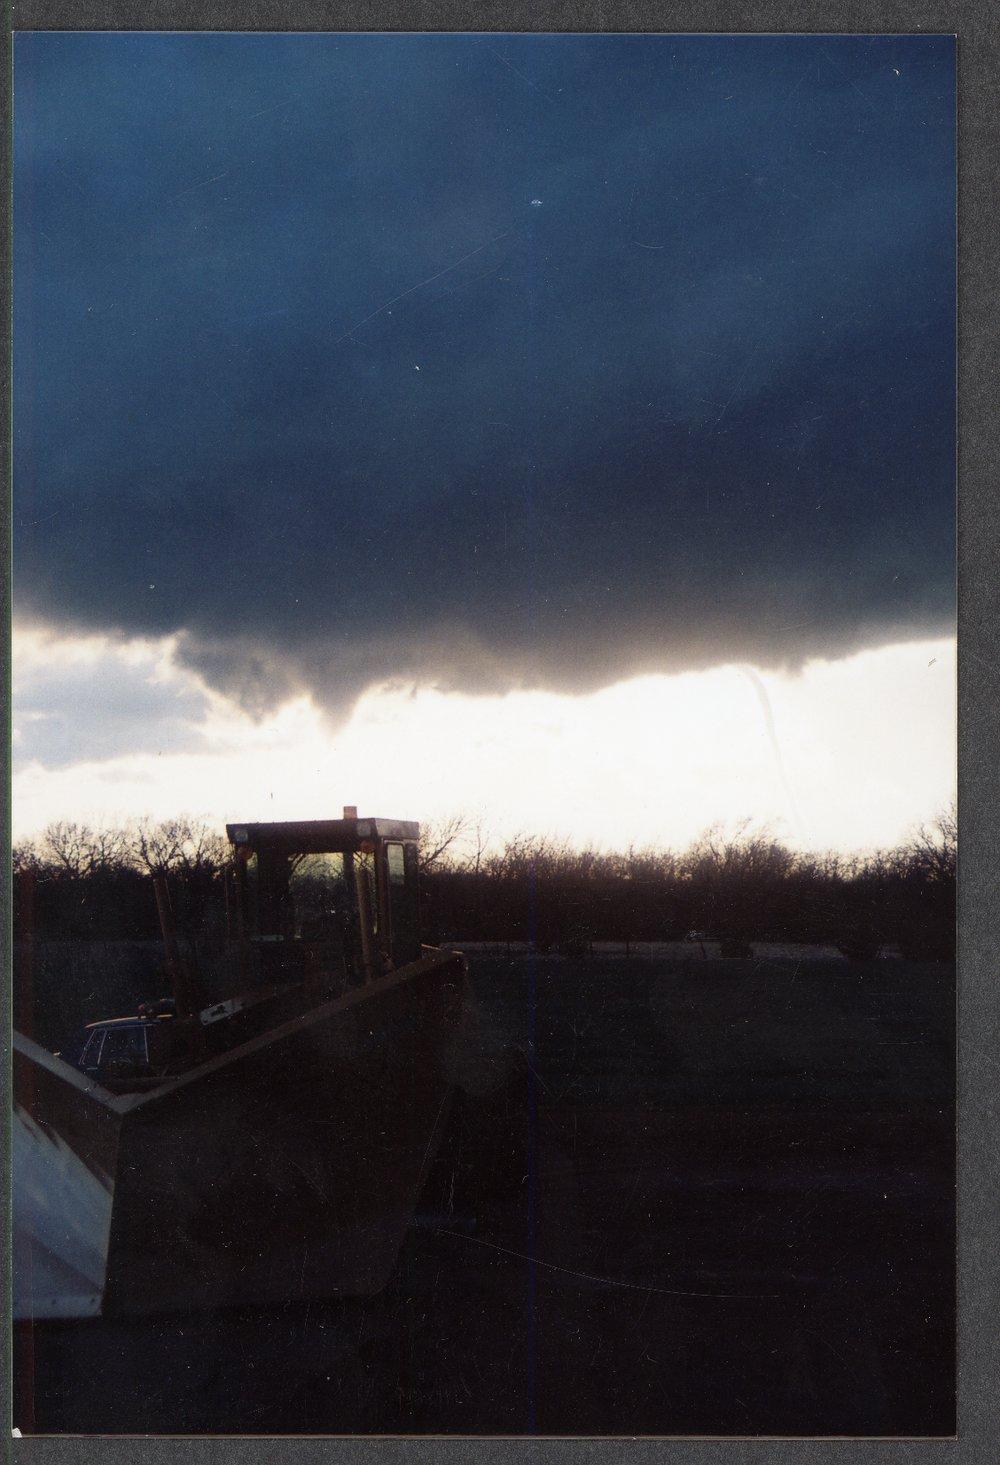 Tornado near Caldwell, Kansas - 1